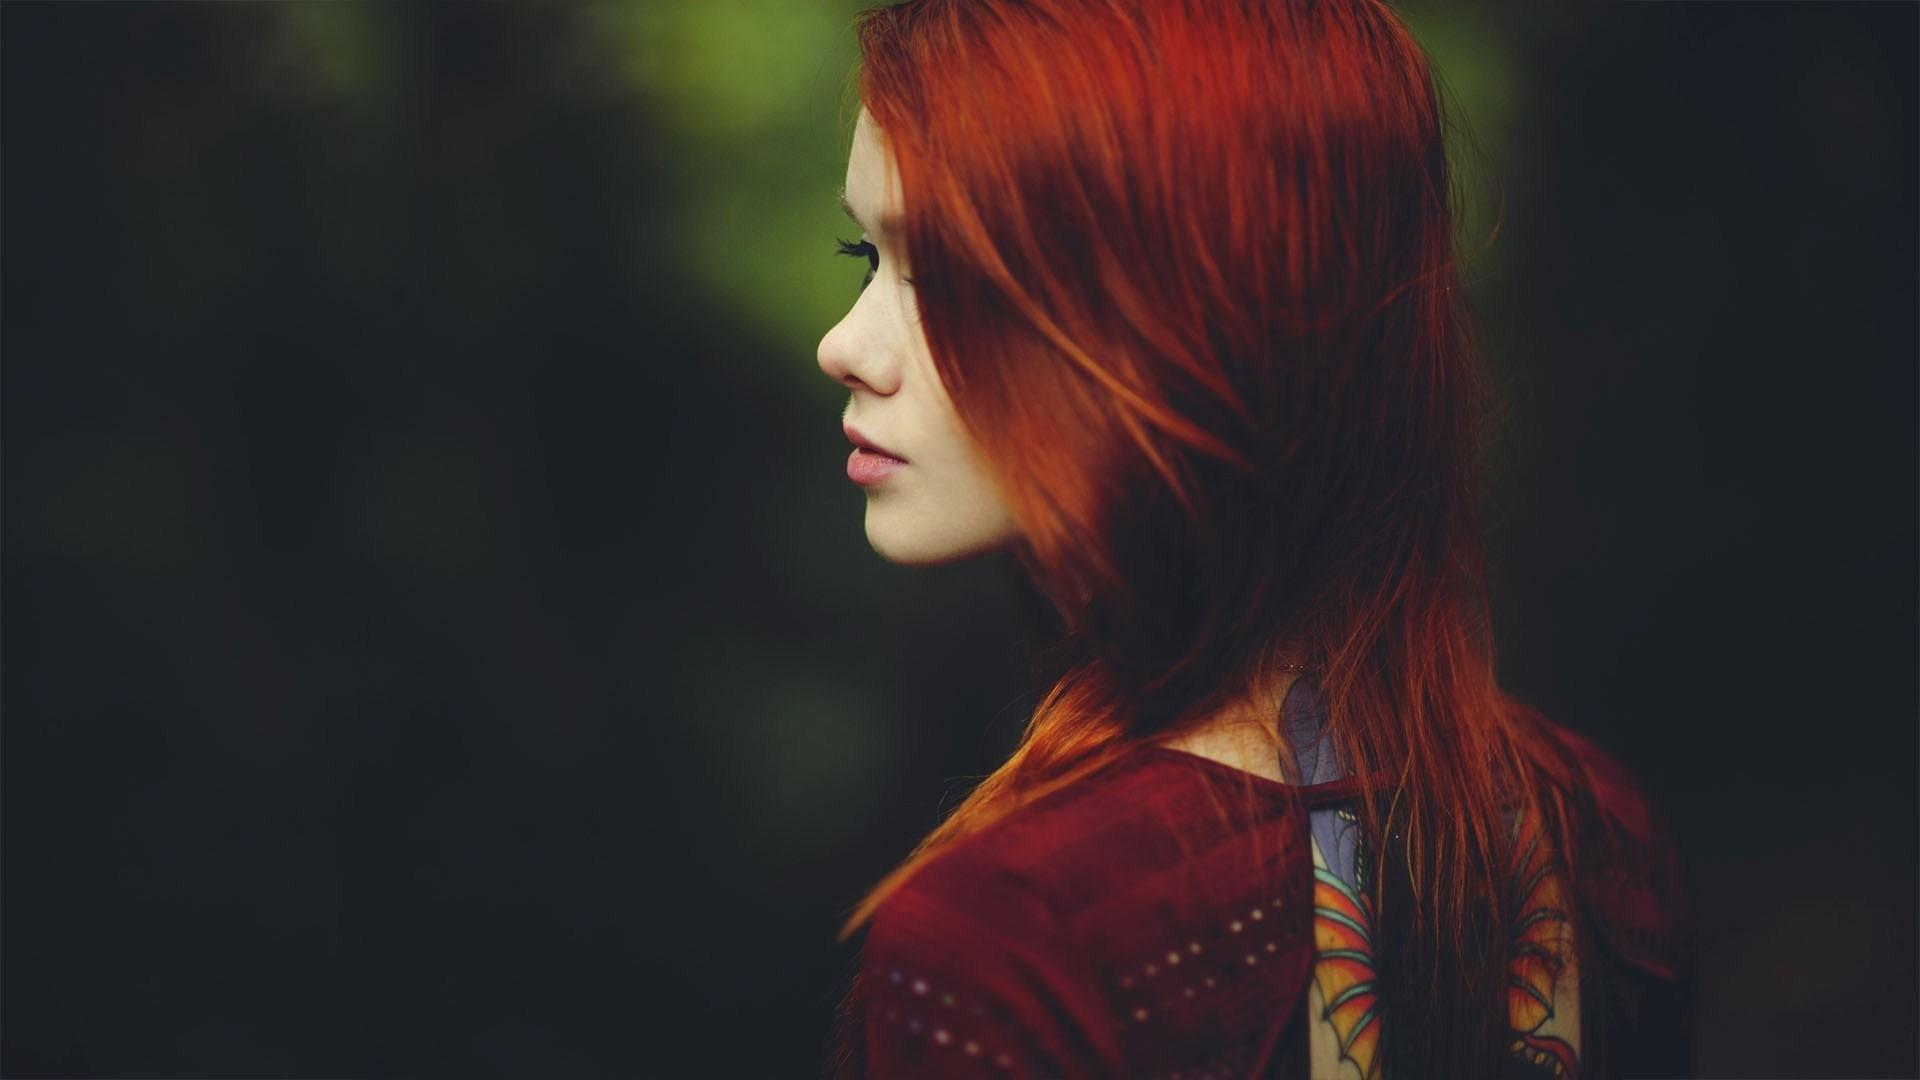 beauty-redhead-girl-model-fashion-tattoo-photo-hd-wallpaper –  Magic4Walls.com